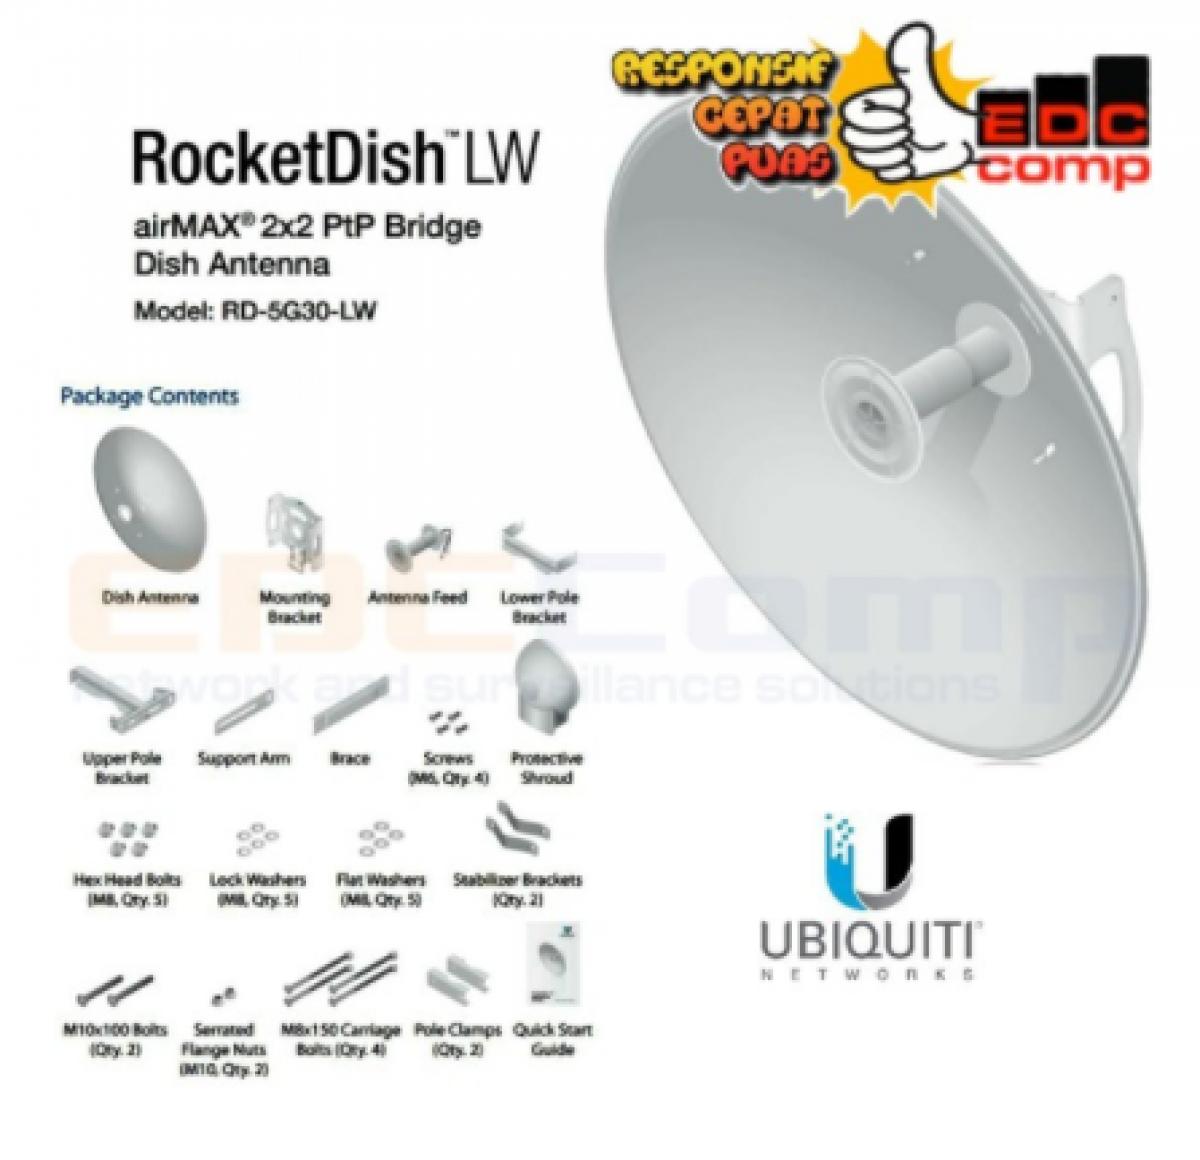 Ubiquiti Rocket Dish / RocketDish 5G 30dBi LW / RD-5G30-LW - EdcComp